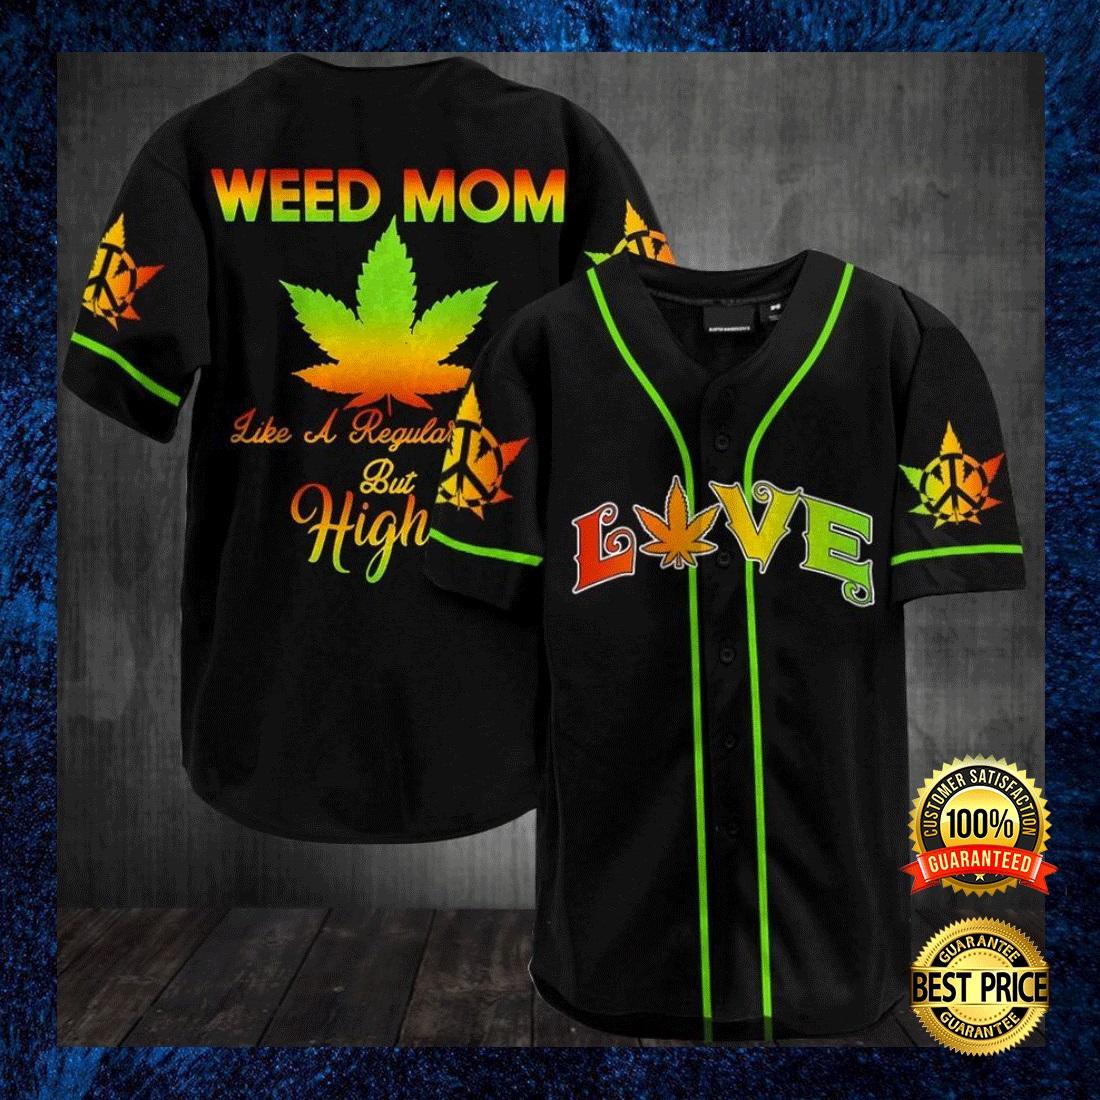 WEED MOM LIKE A REGULAR MOM BUT HIGHER BASEBALL JERSEY 4